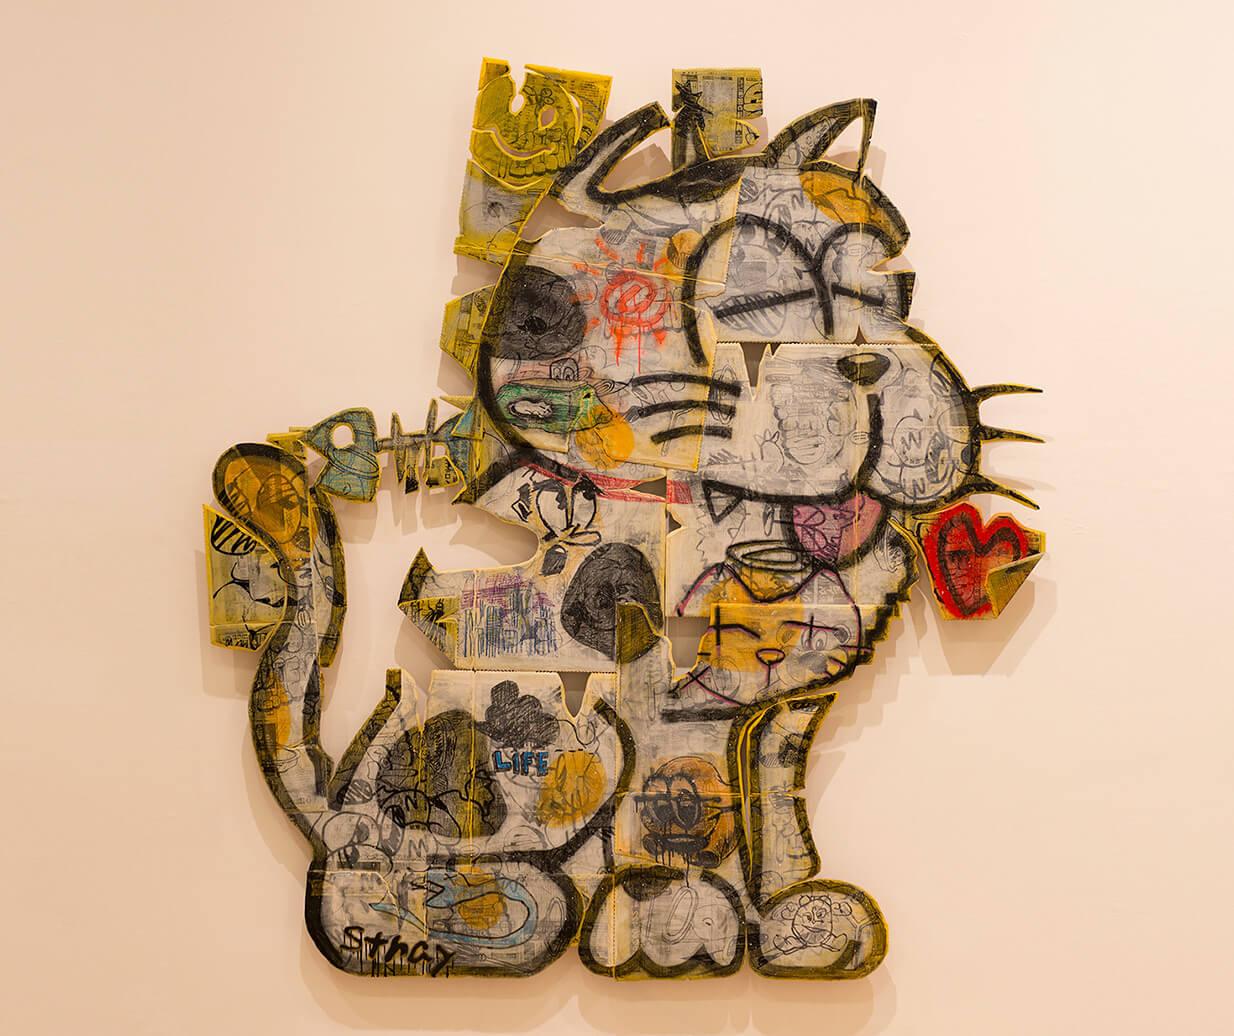 洲間 大輝『Friends Portrait-cat』